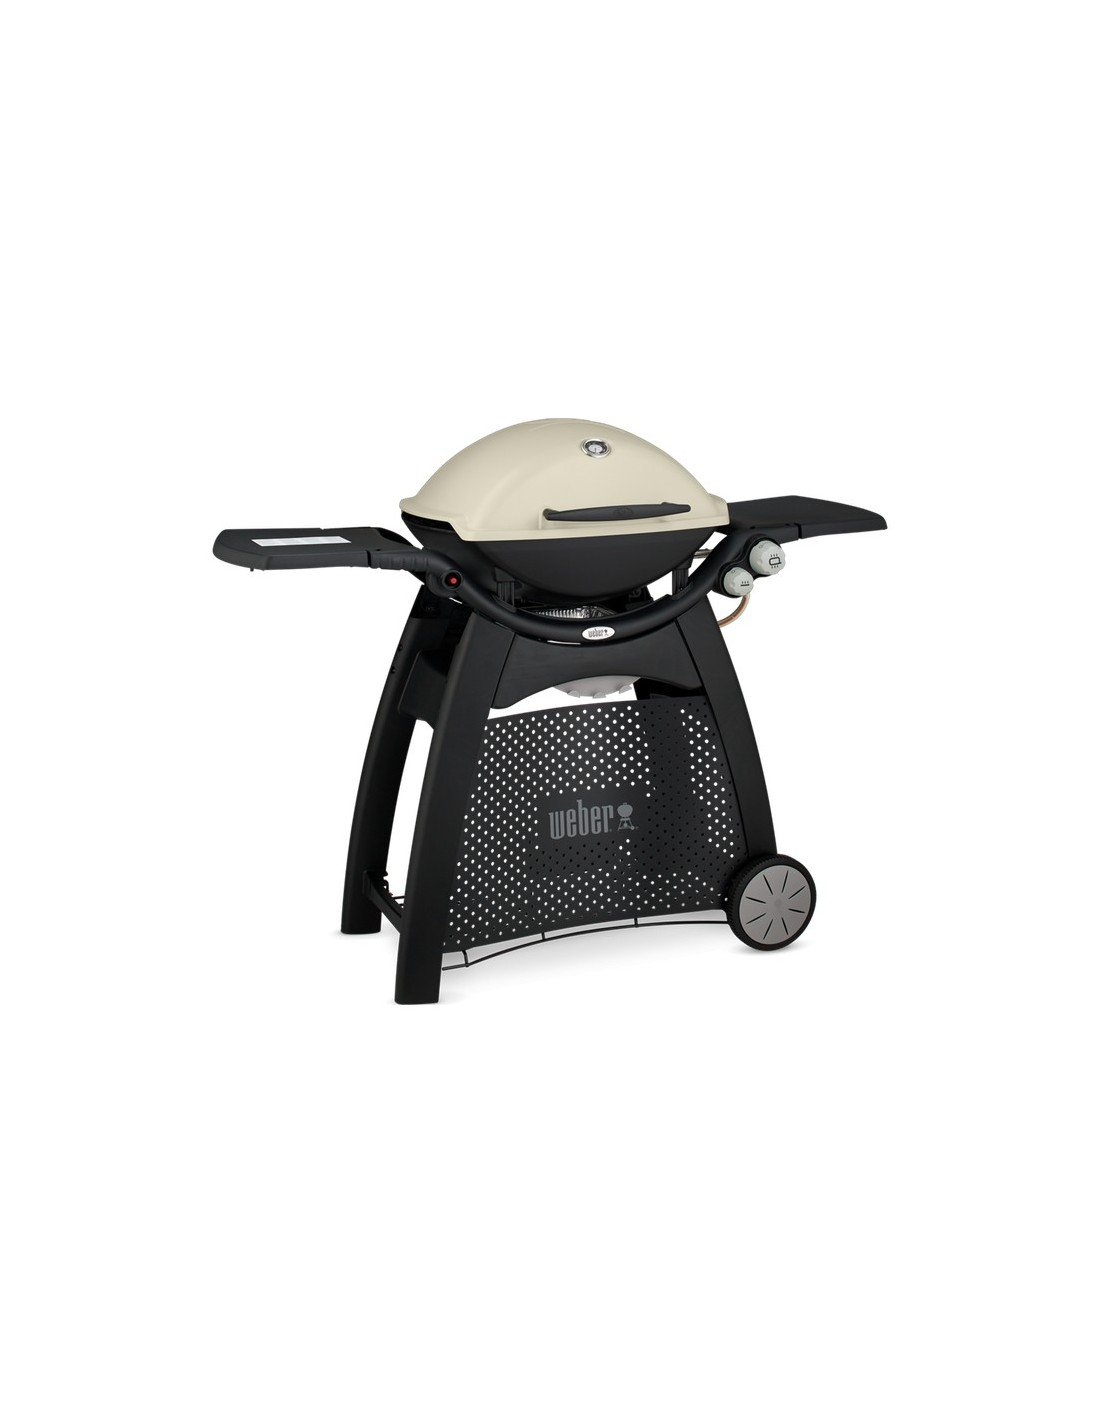 barbecue gaz q 3000 titanium avec chariot weber. Black Bedroom Furniture Sets. Home Design Ideas